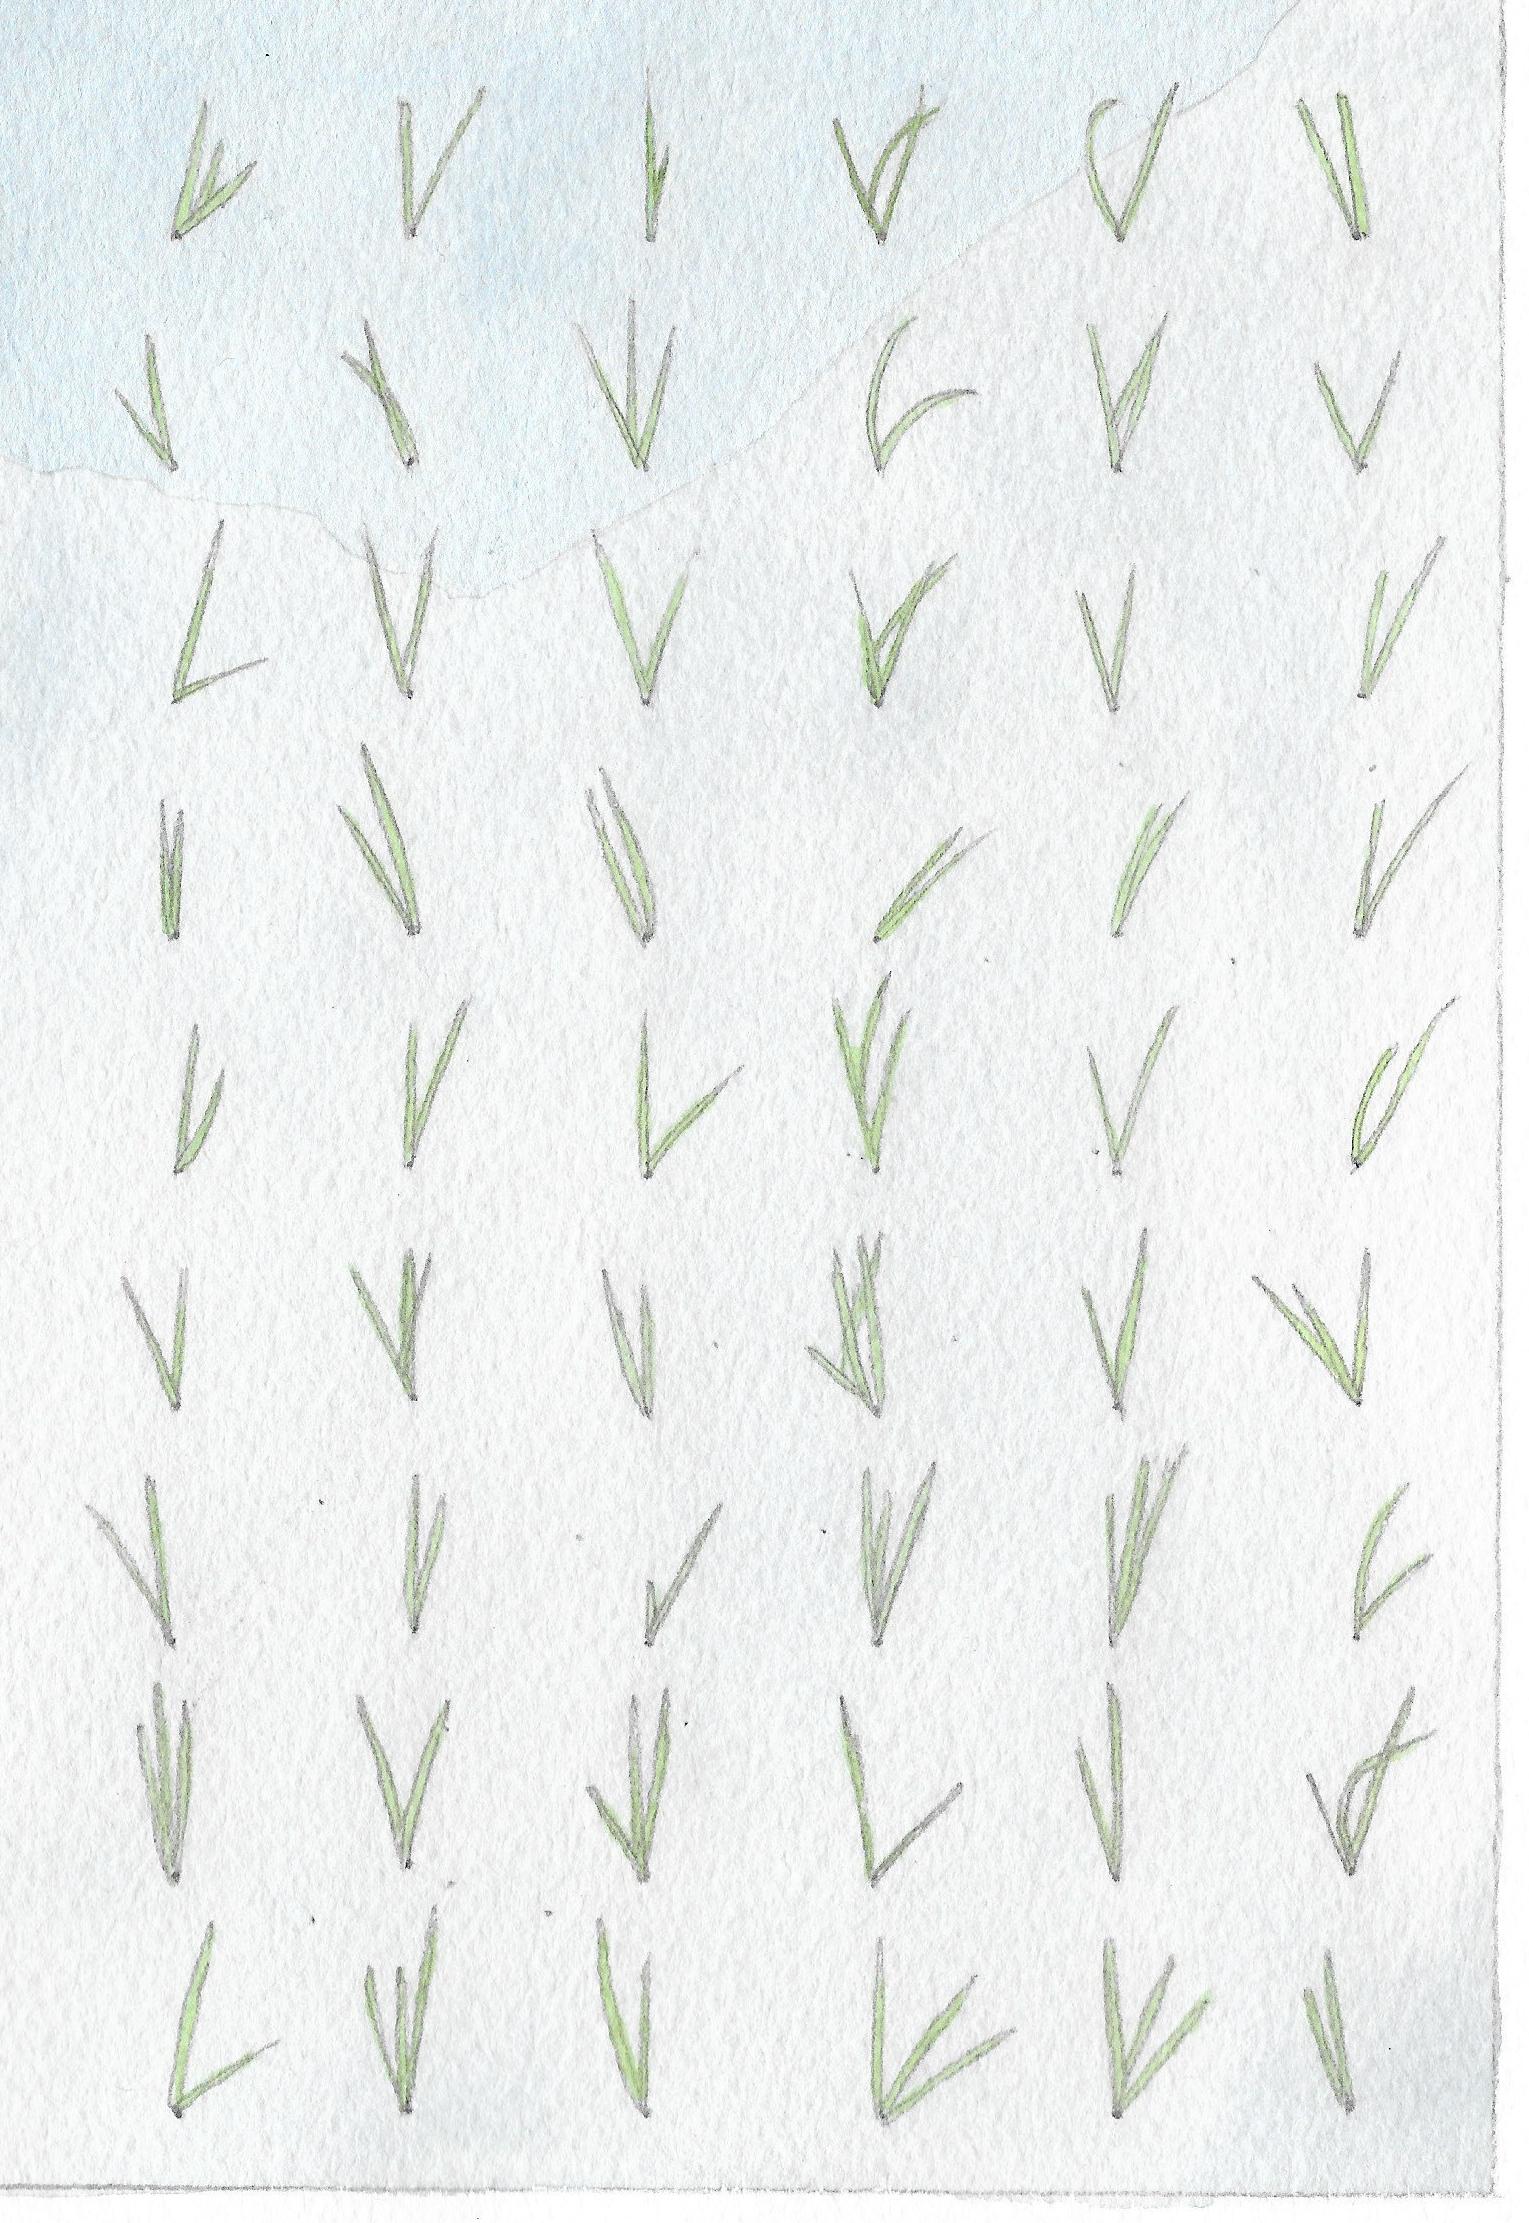 glasshouse-rice1.jpg